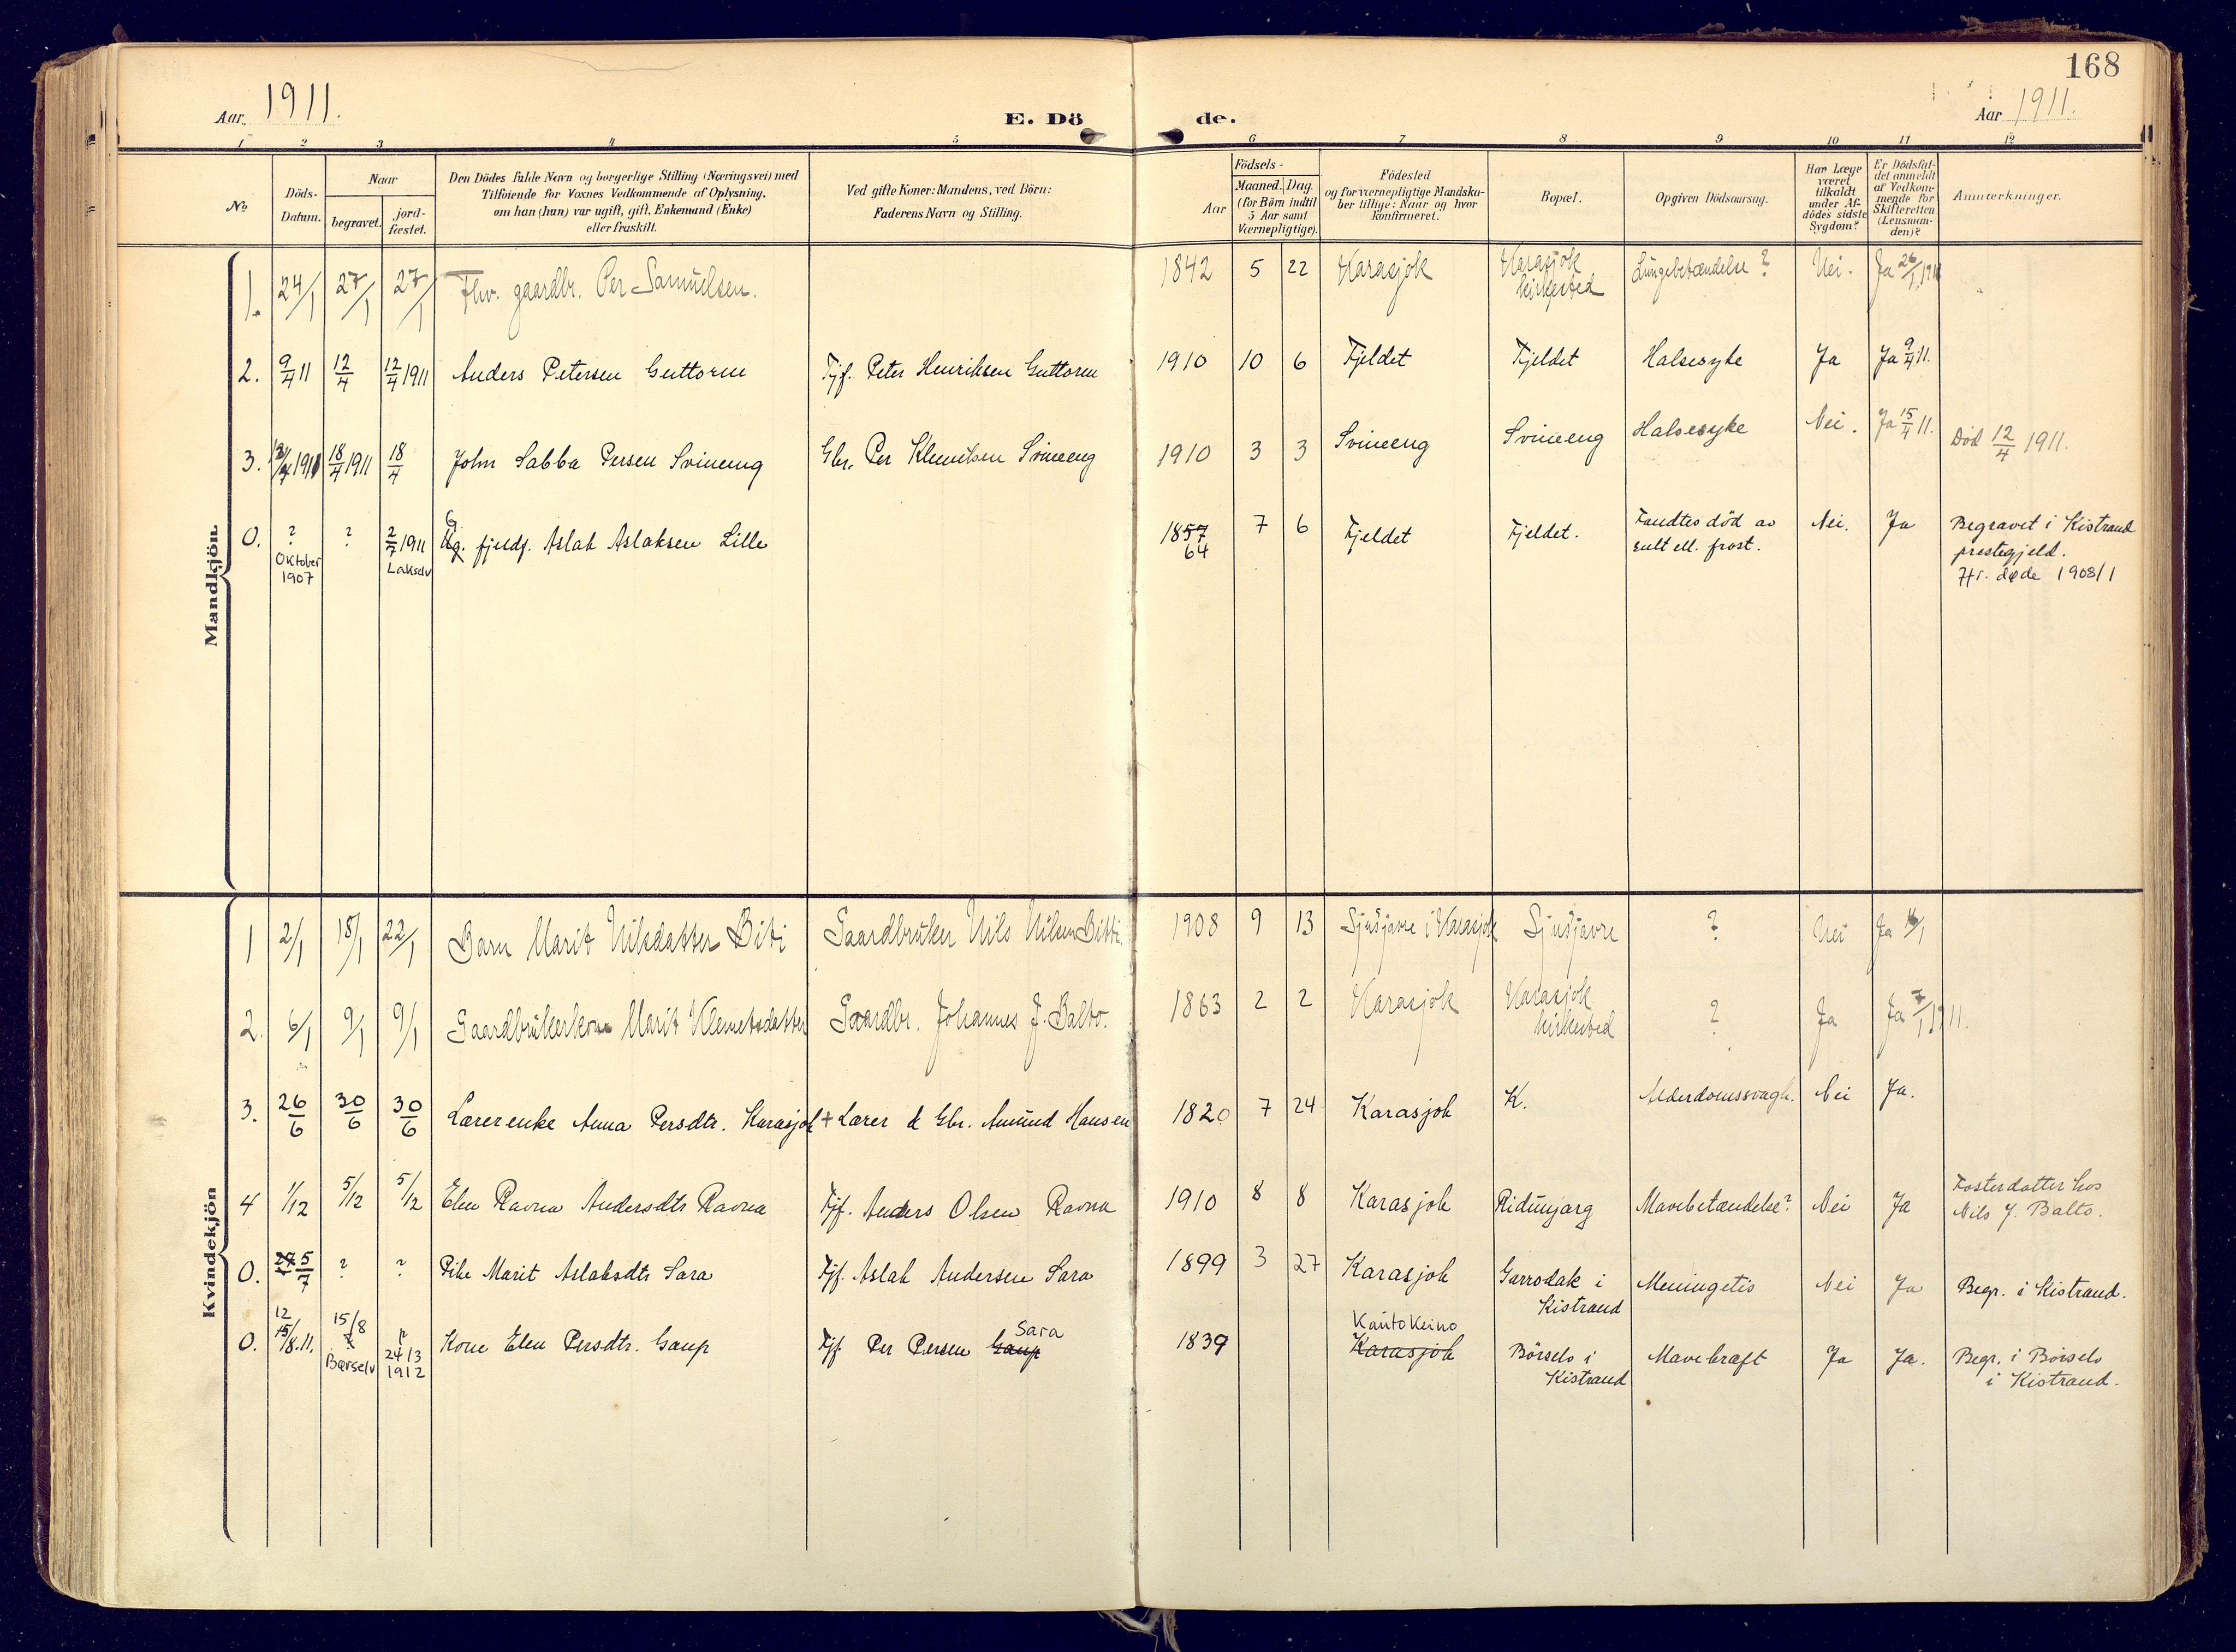 SATØ, Karasjok sokneprestkontor, H/Ha: Ministerialbok nr. 3, 1907-1926, s. 168